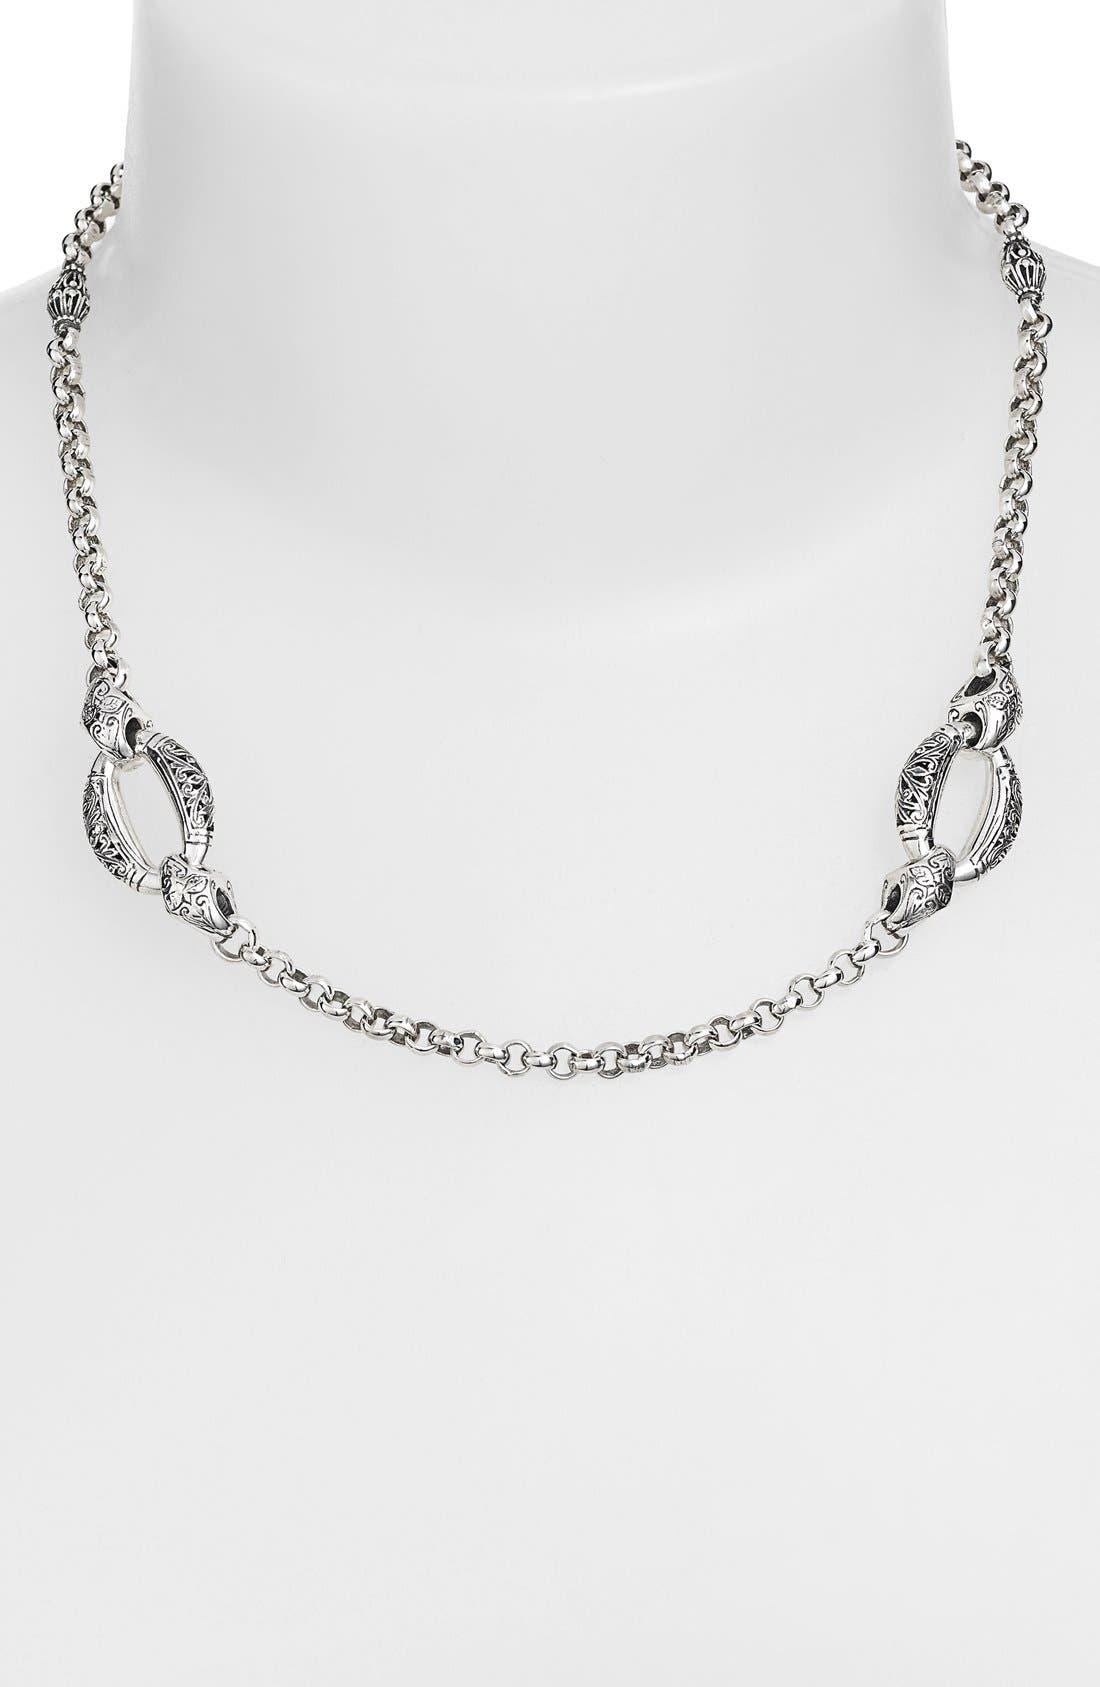 Konstantino 'Classics - Daphne' Link Necklace